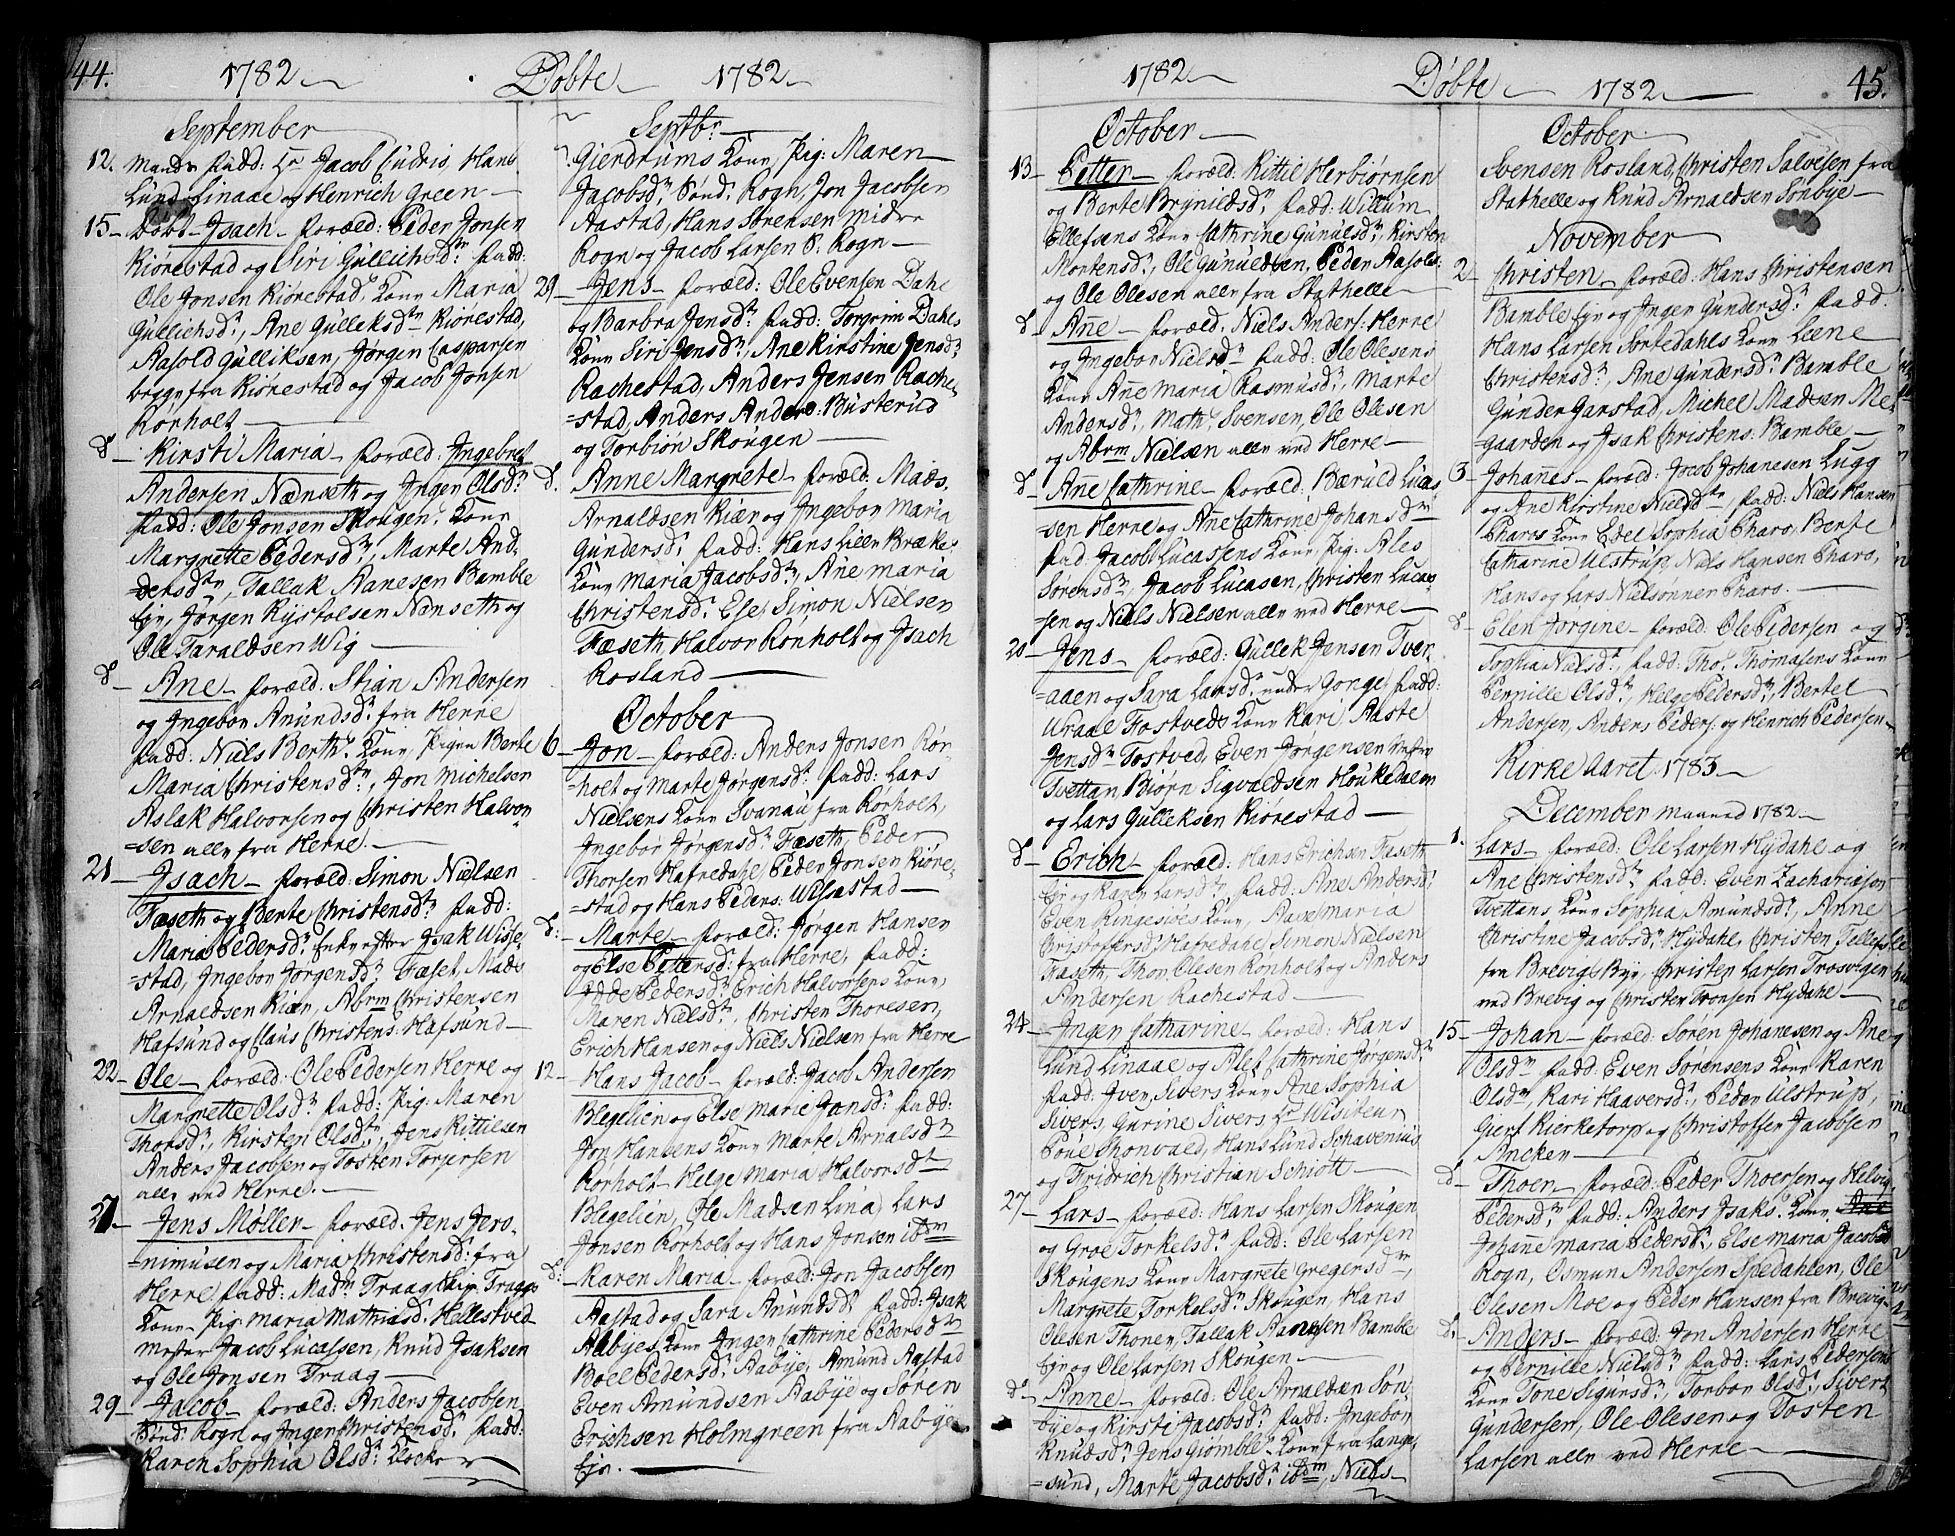 SAKO, Bamble kirkebøker, F/Fa/L0002: Ministerialbok nr. I 2, 1775-1814, s. 44-45